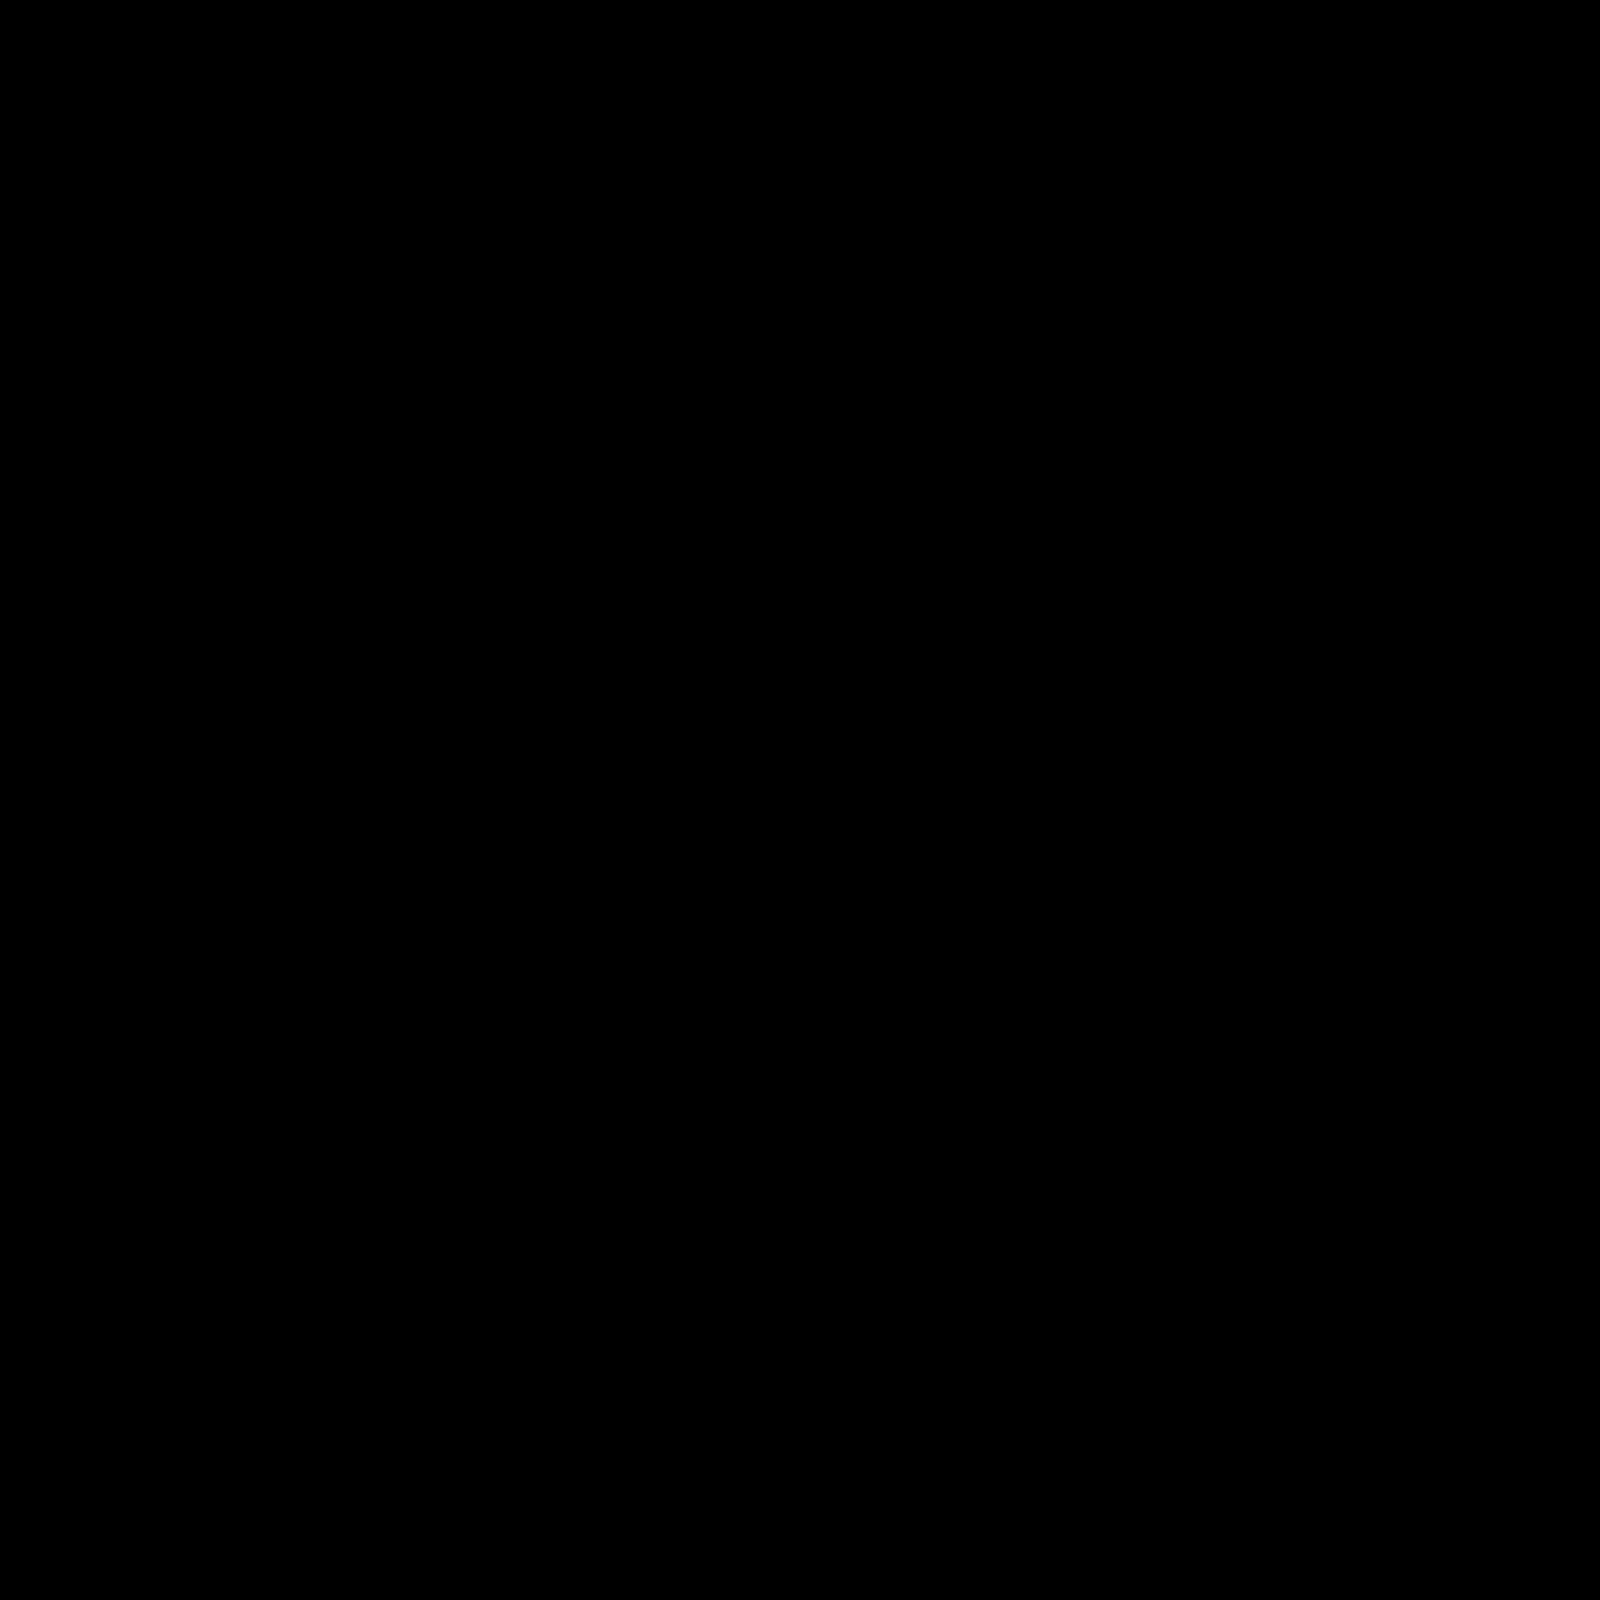 Below Filled icon